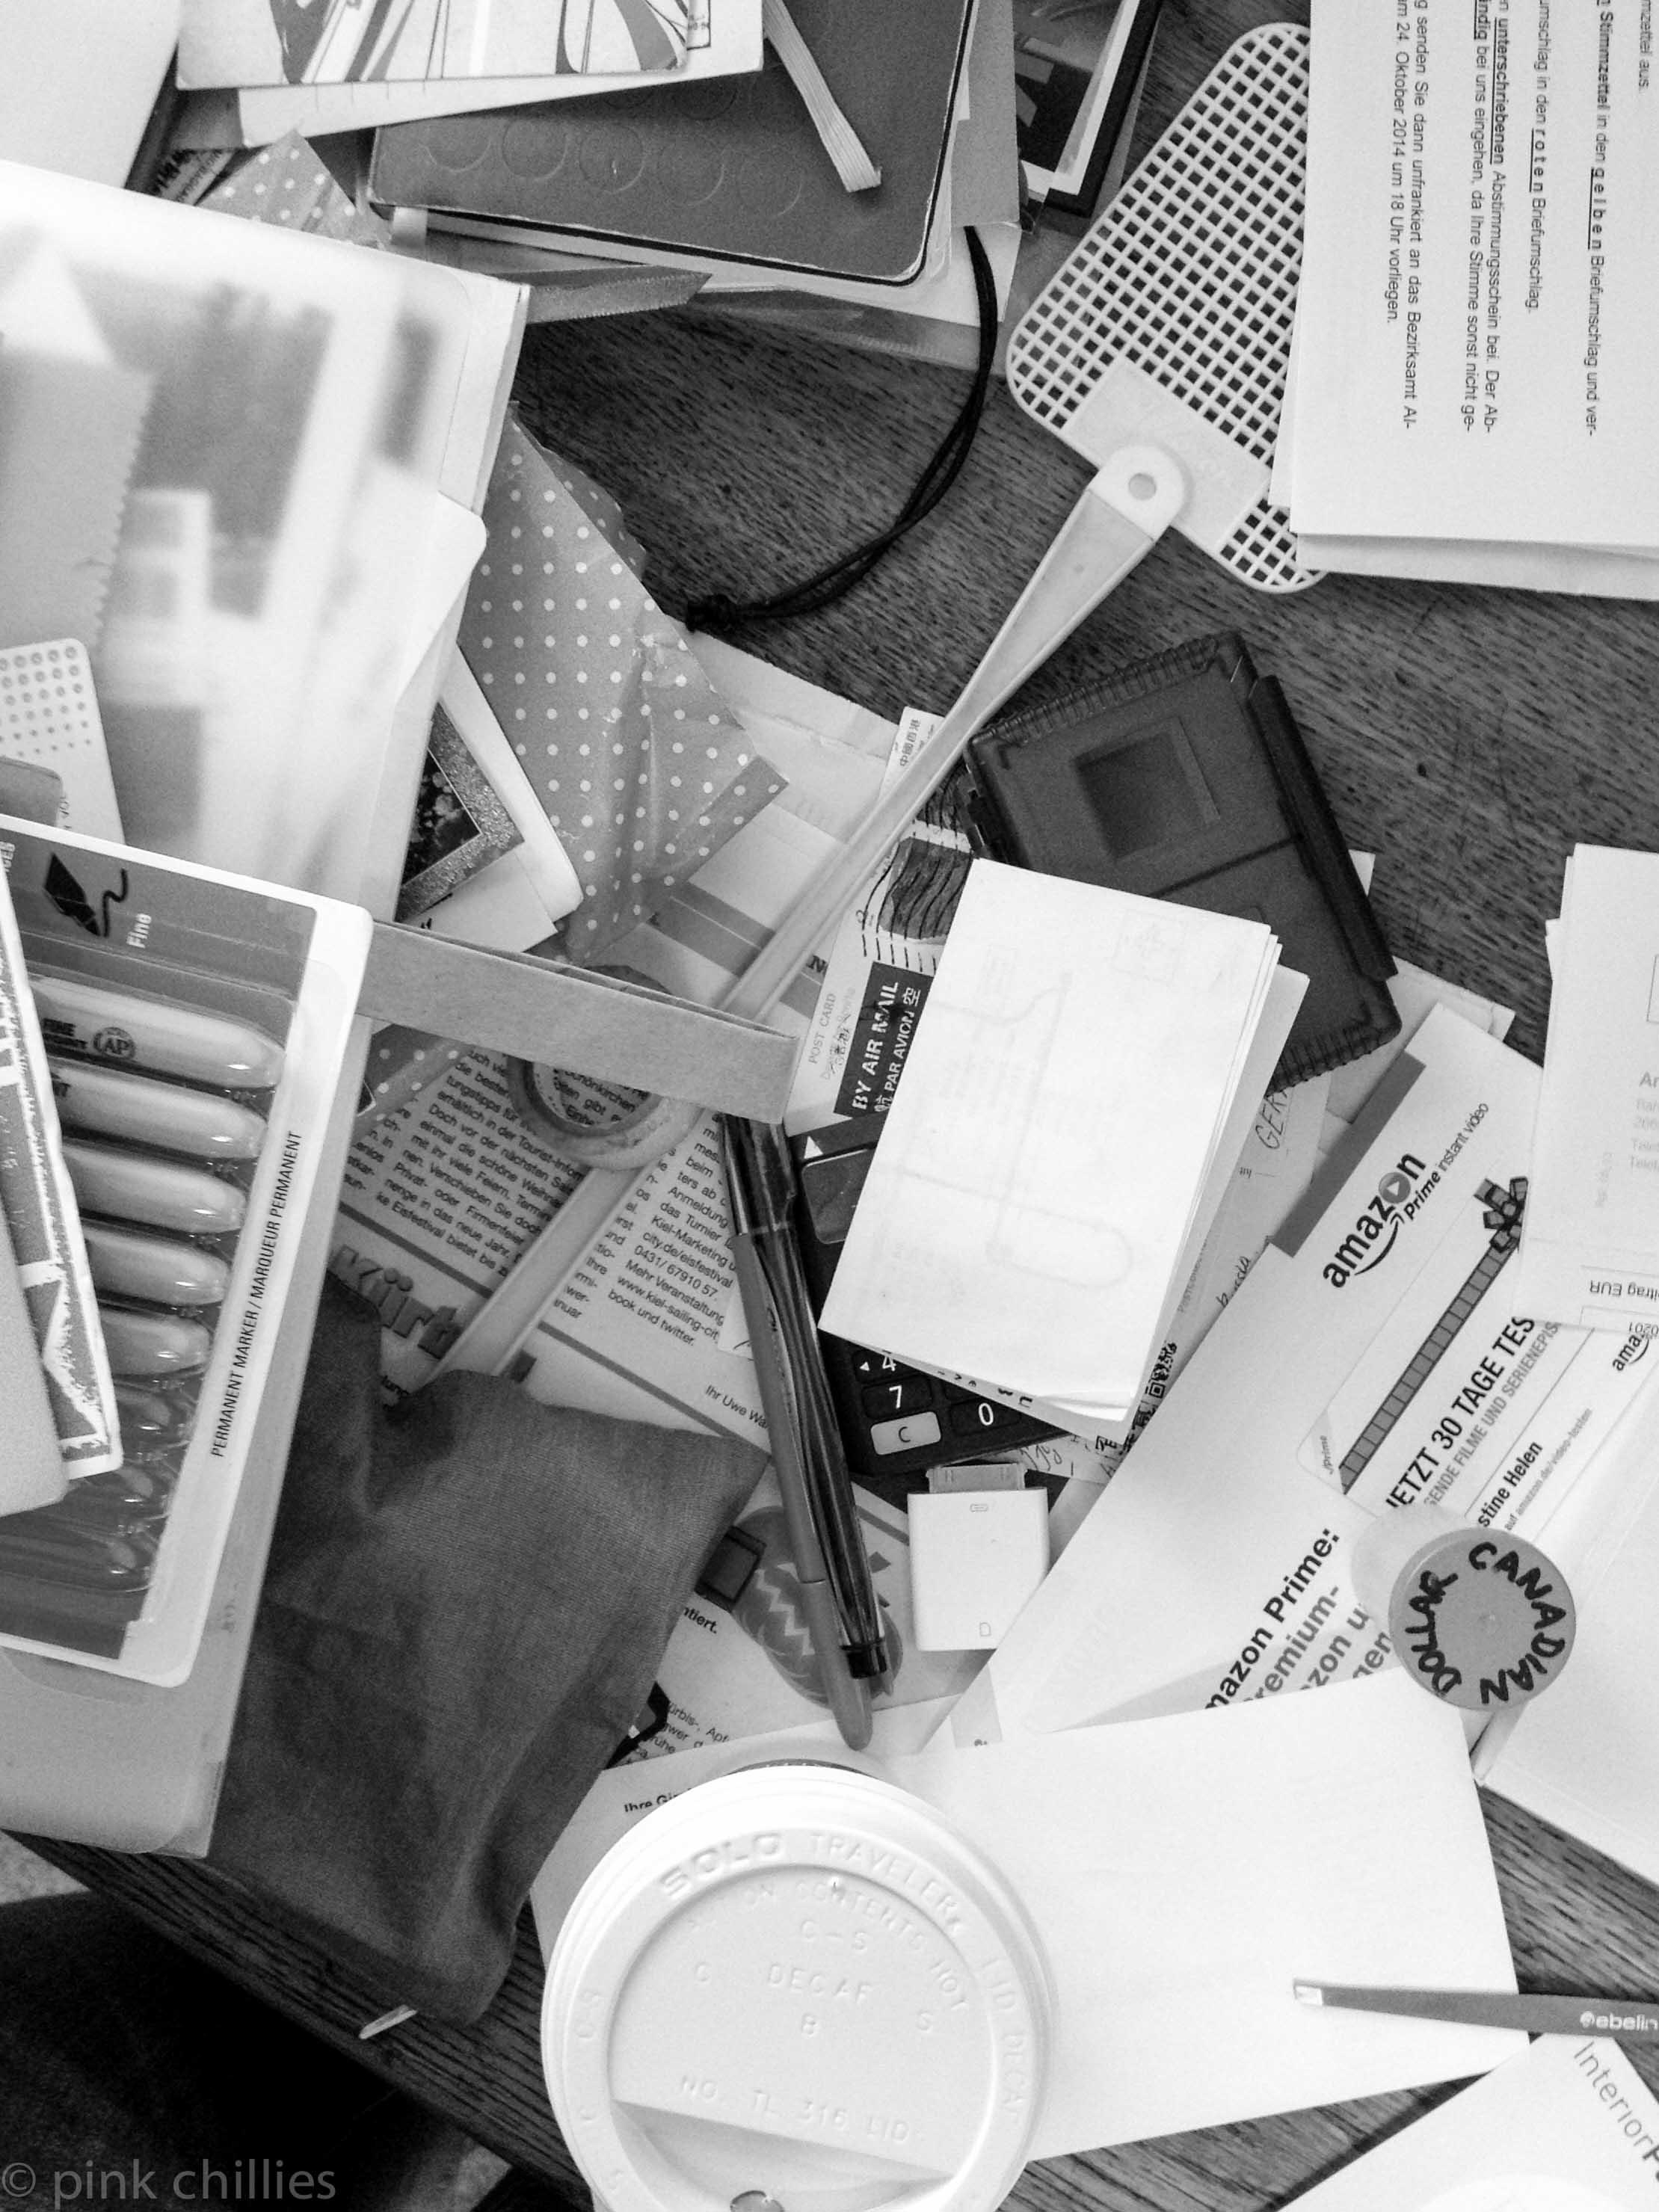 Schreibtisch Chaos